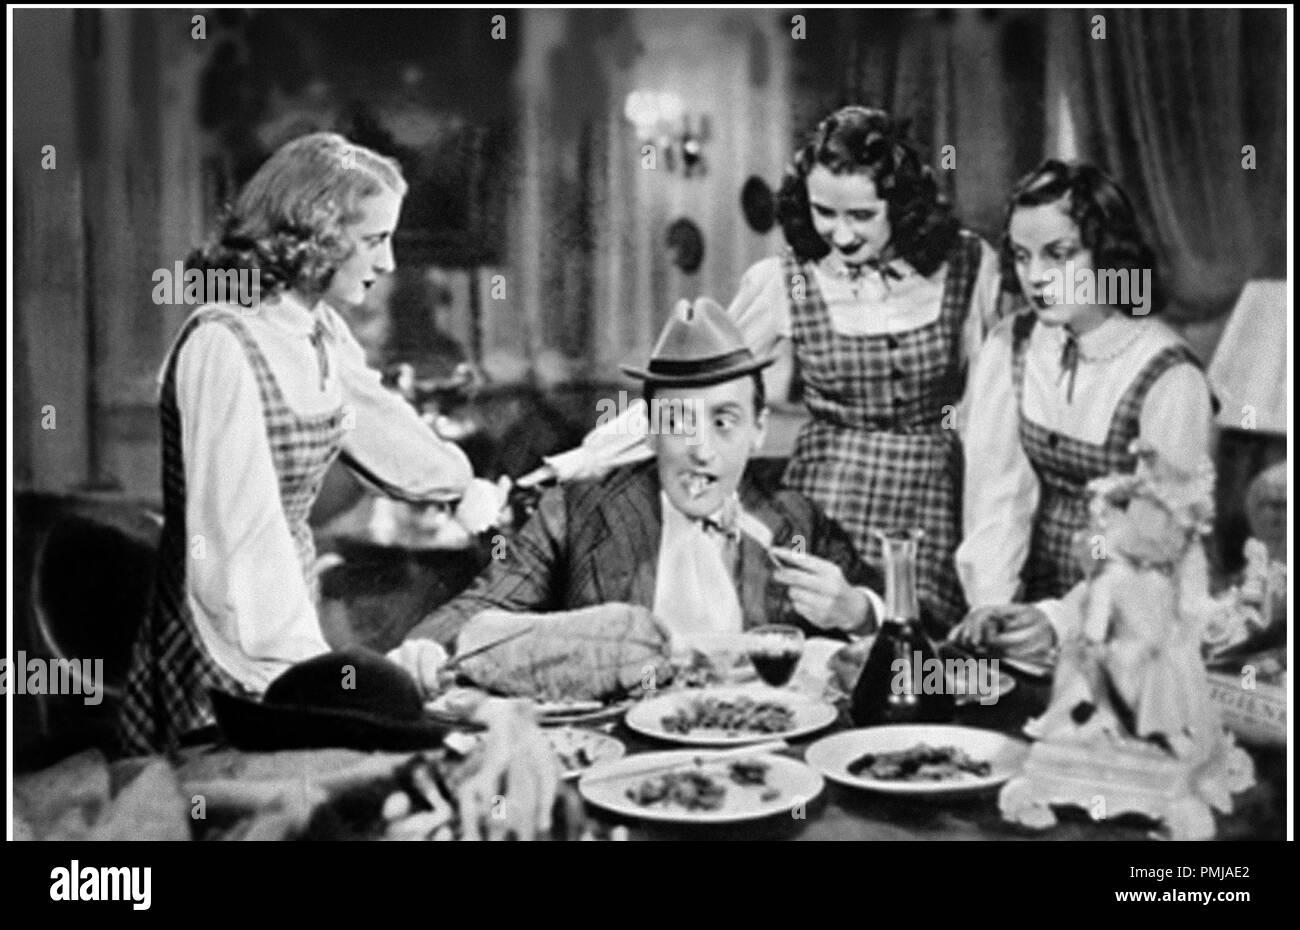 Prod DB © Fono Roma - Produzione Capitani Film / DR L'allegro fantasma de Amleto Palermi 1941 ITA. avec Toto seducteur, homme entoure de femmes, la mangiatoia Immagini Stock